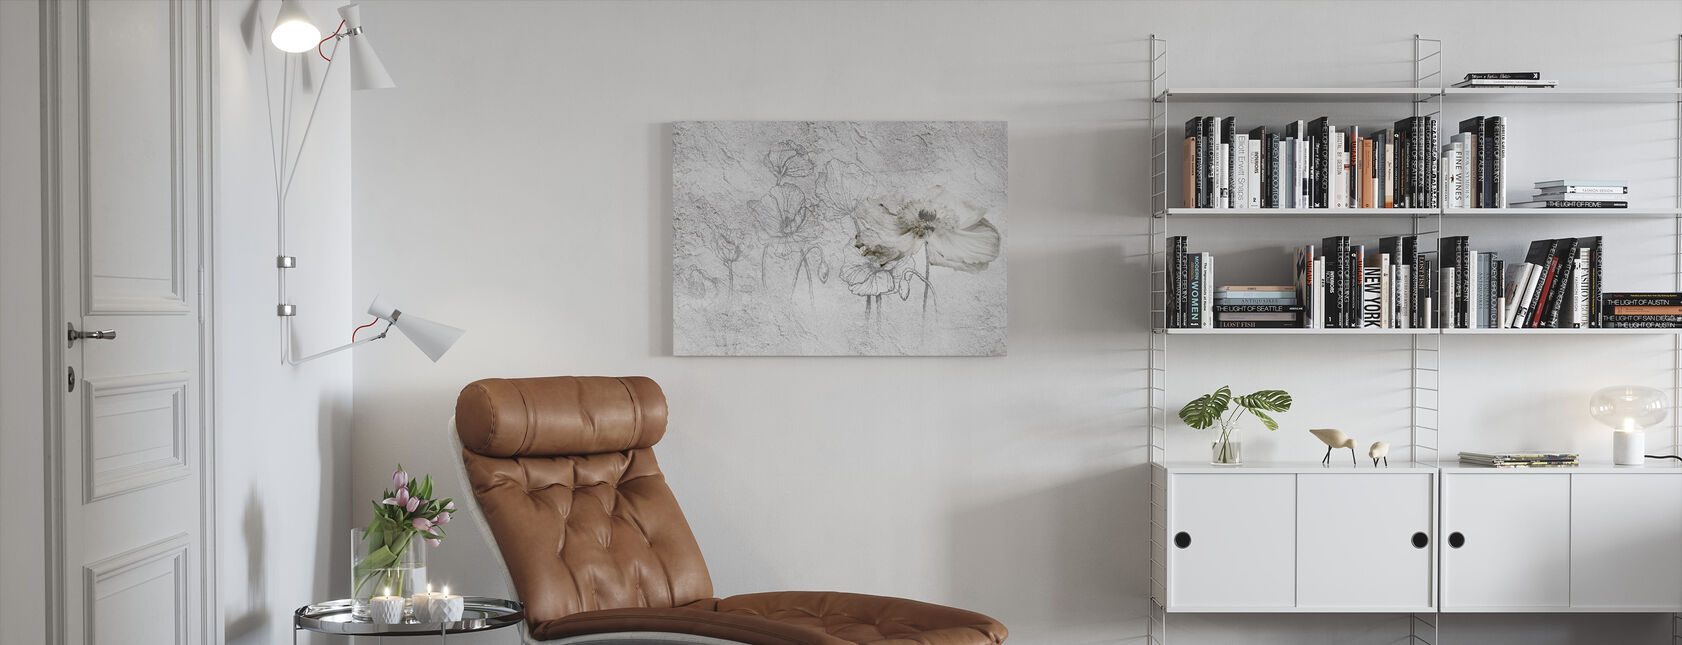 Flowers on Craking Wall - Canvas print - Living Room